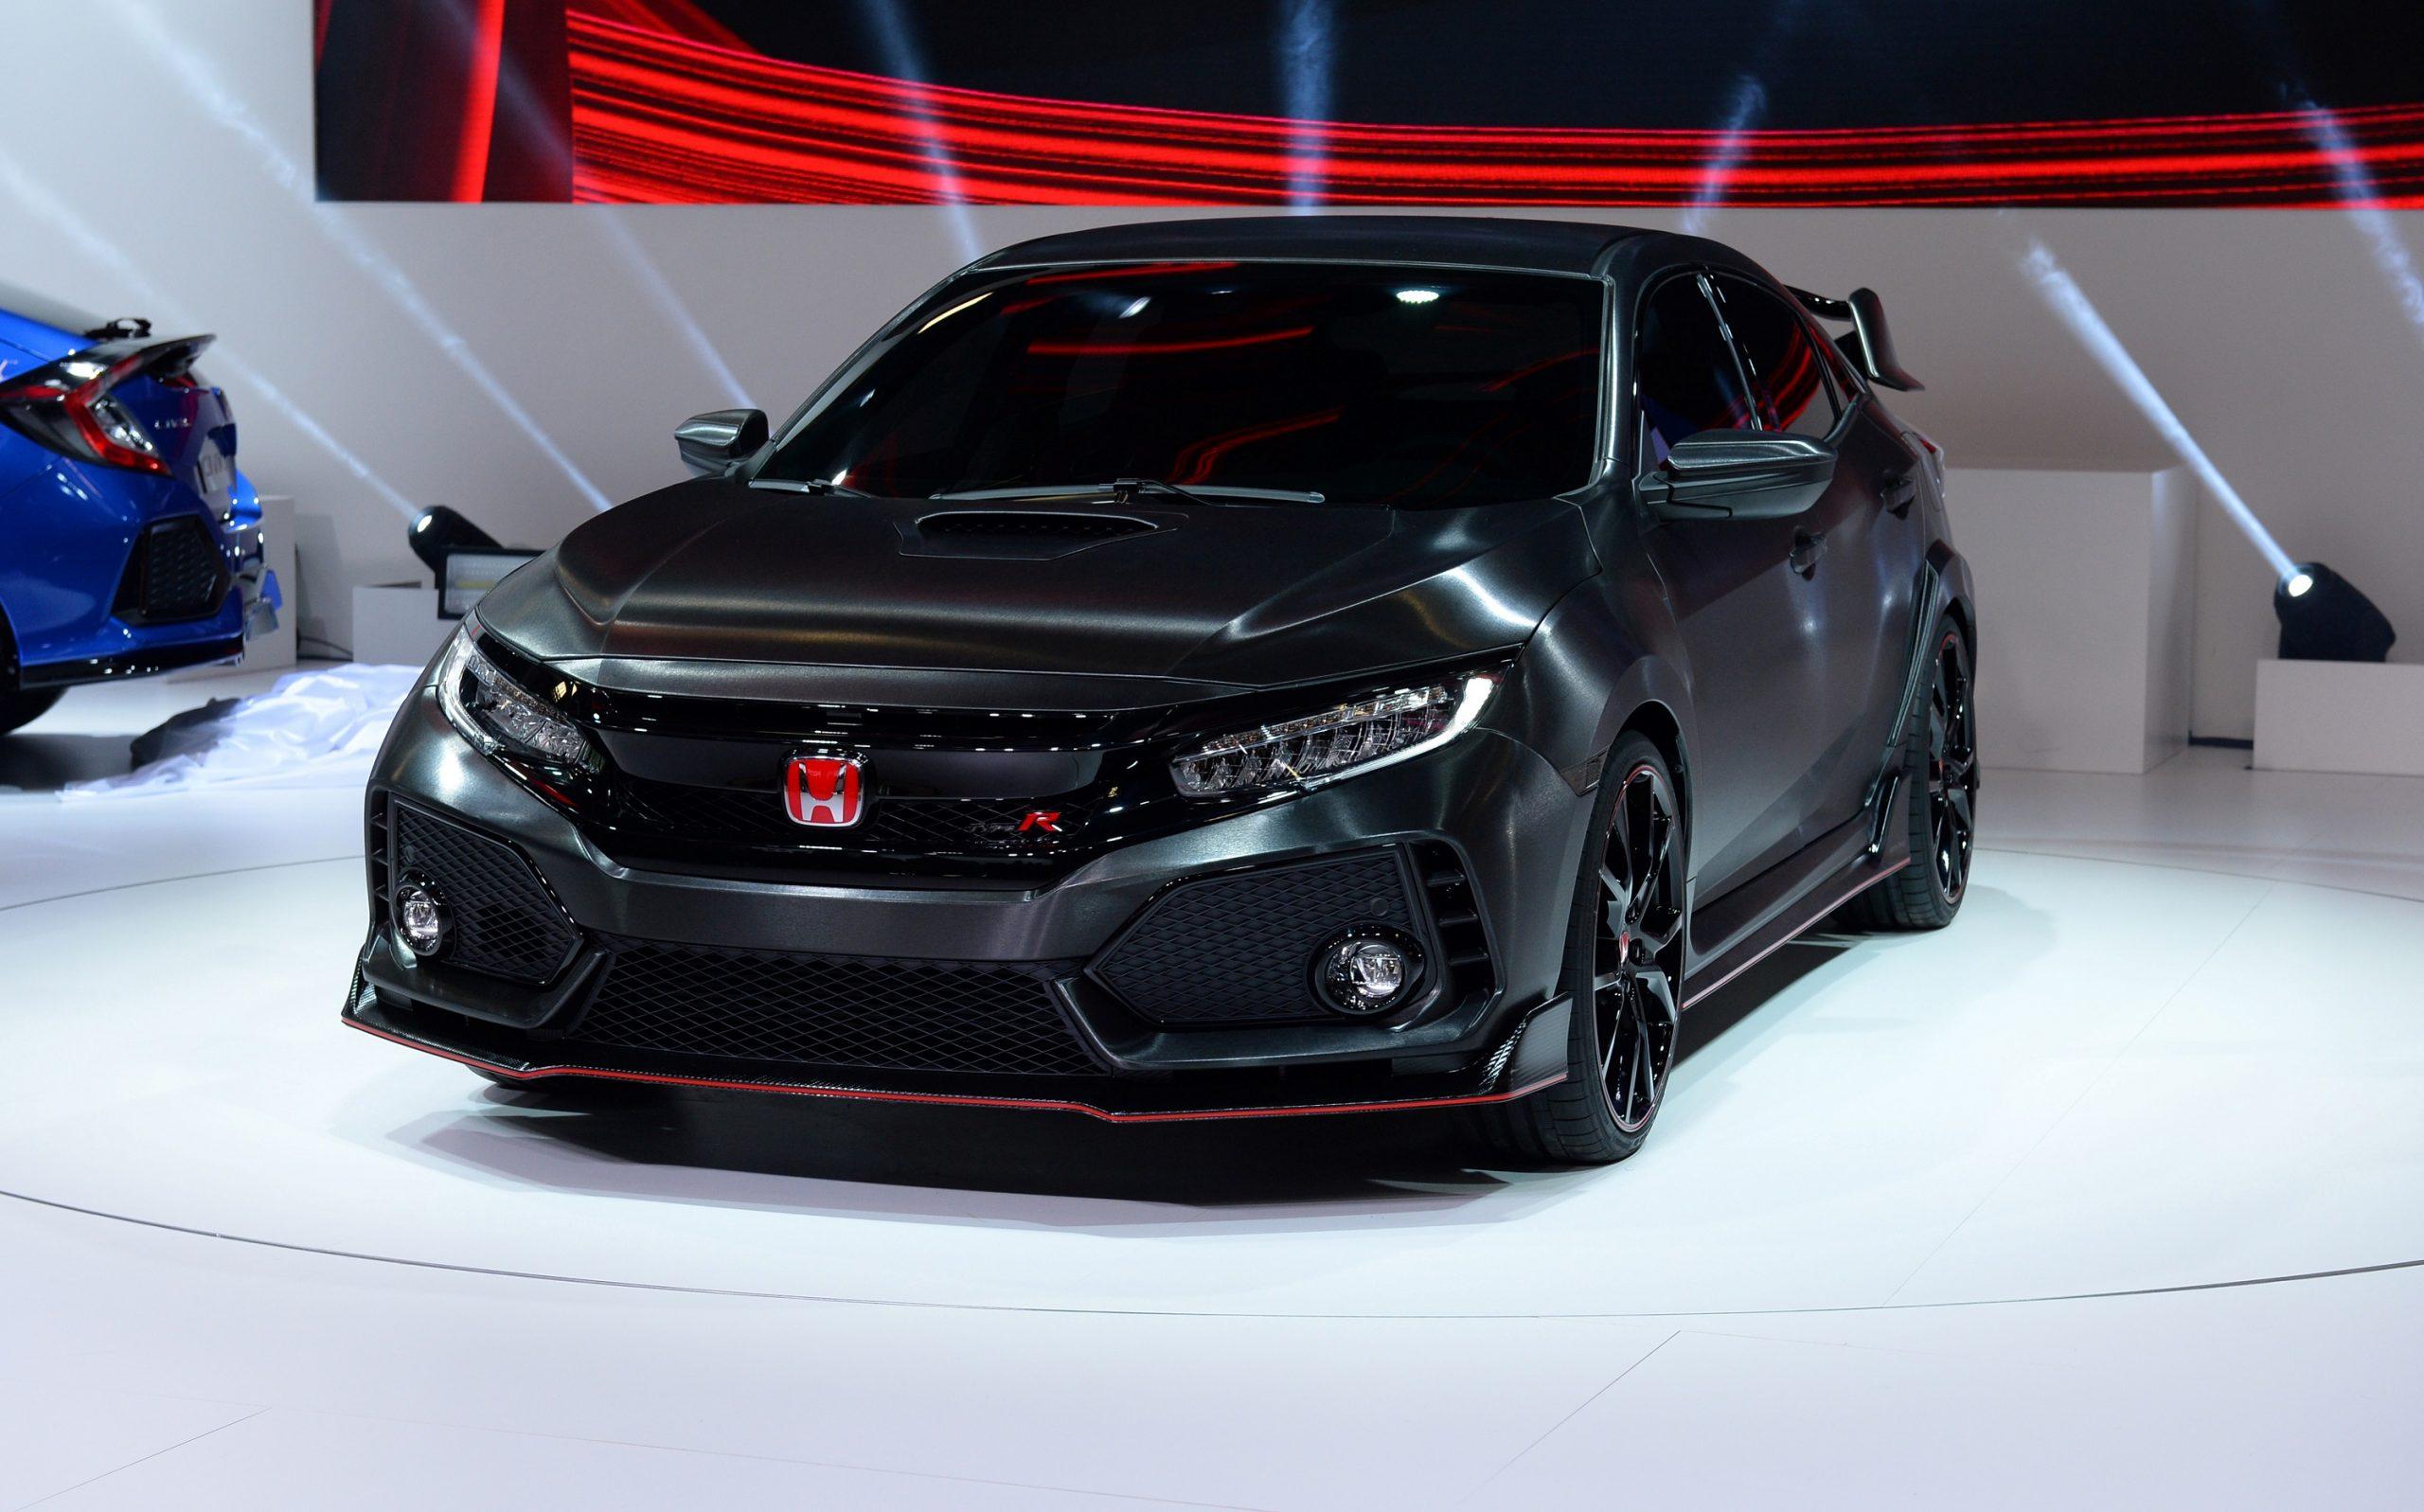 A black 2022 Honda Civic Type R shot at a motor show in Paris